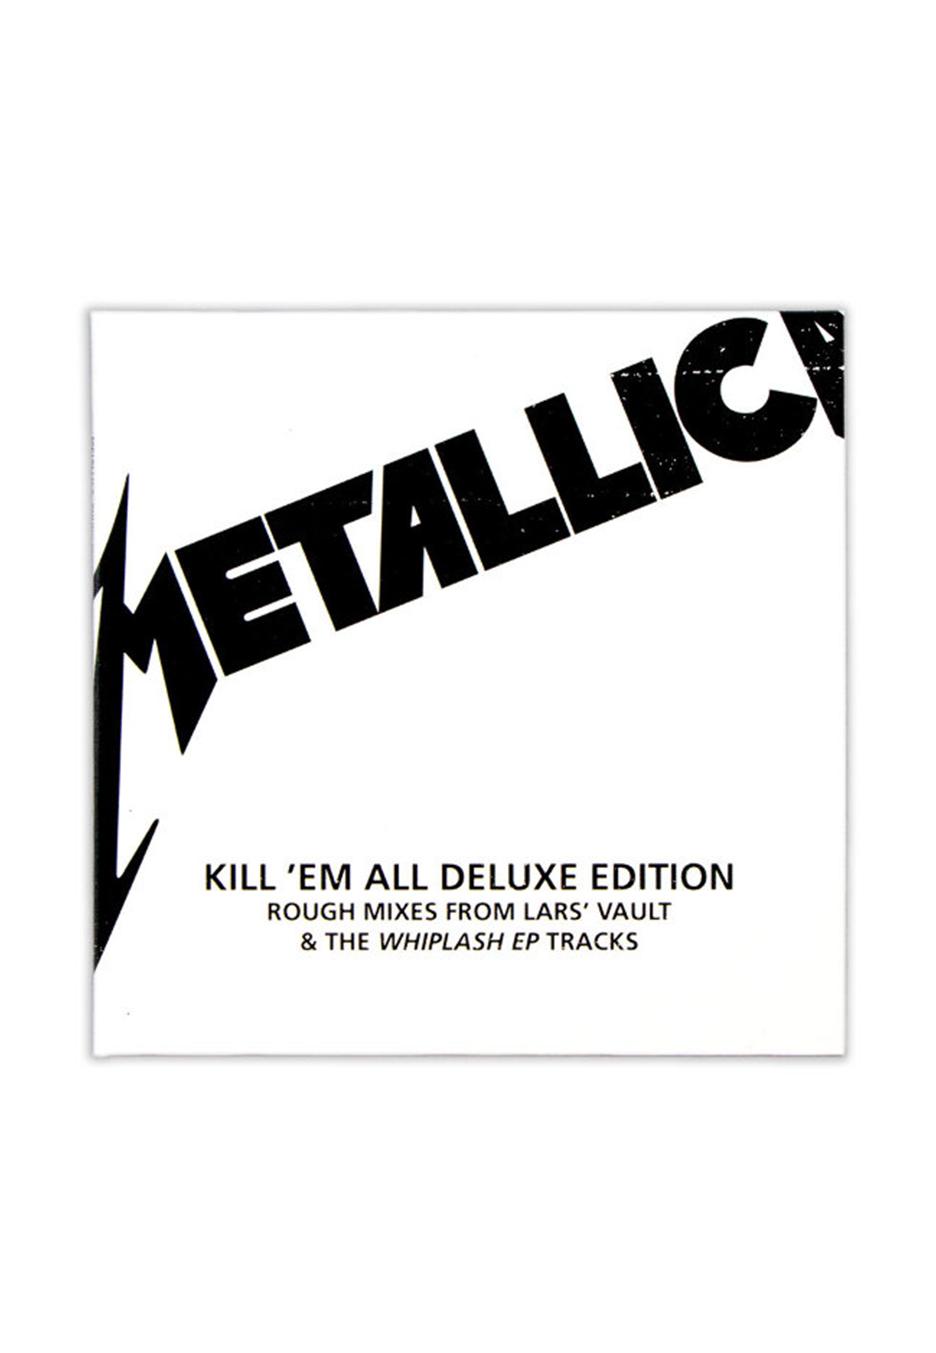 Metallica – kill 'em all || deluxe boxset || limited edition.